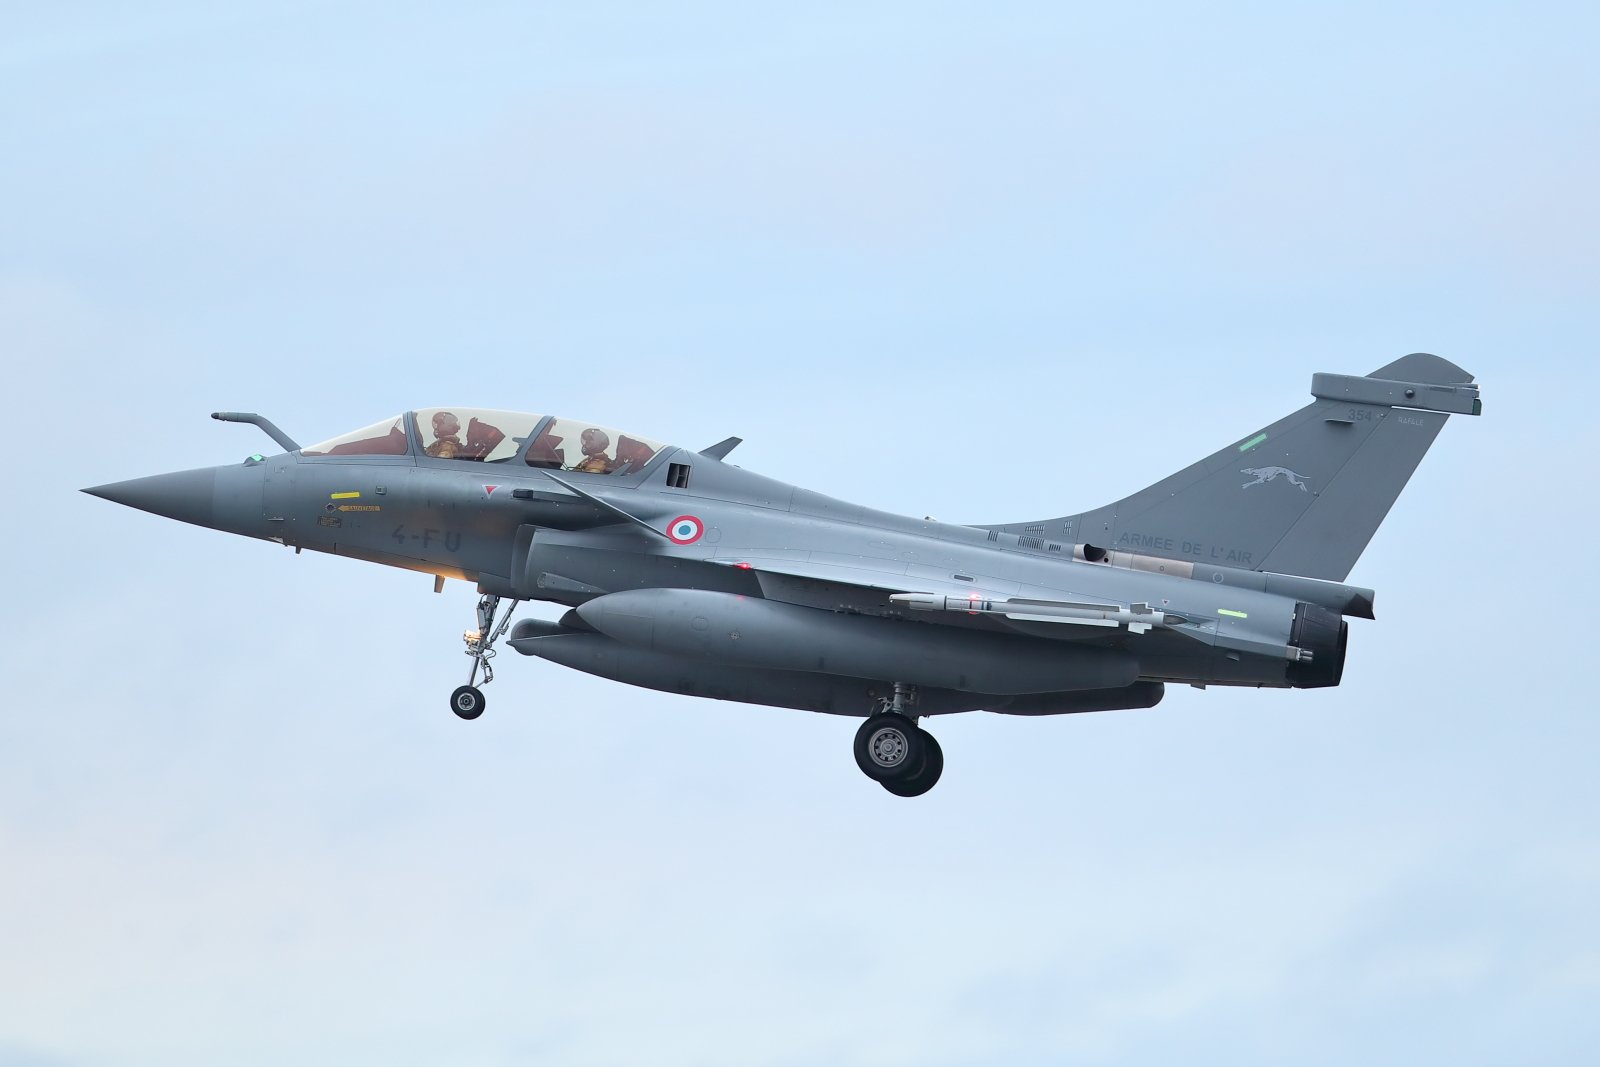 Dassault Rafale B 354 laskussa Pirkkalaan 2020 01 20